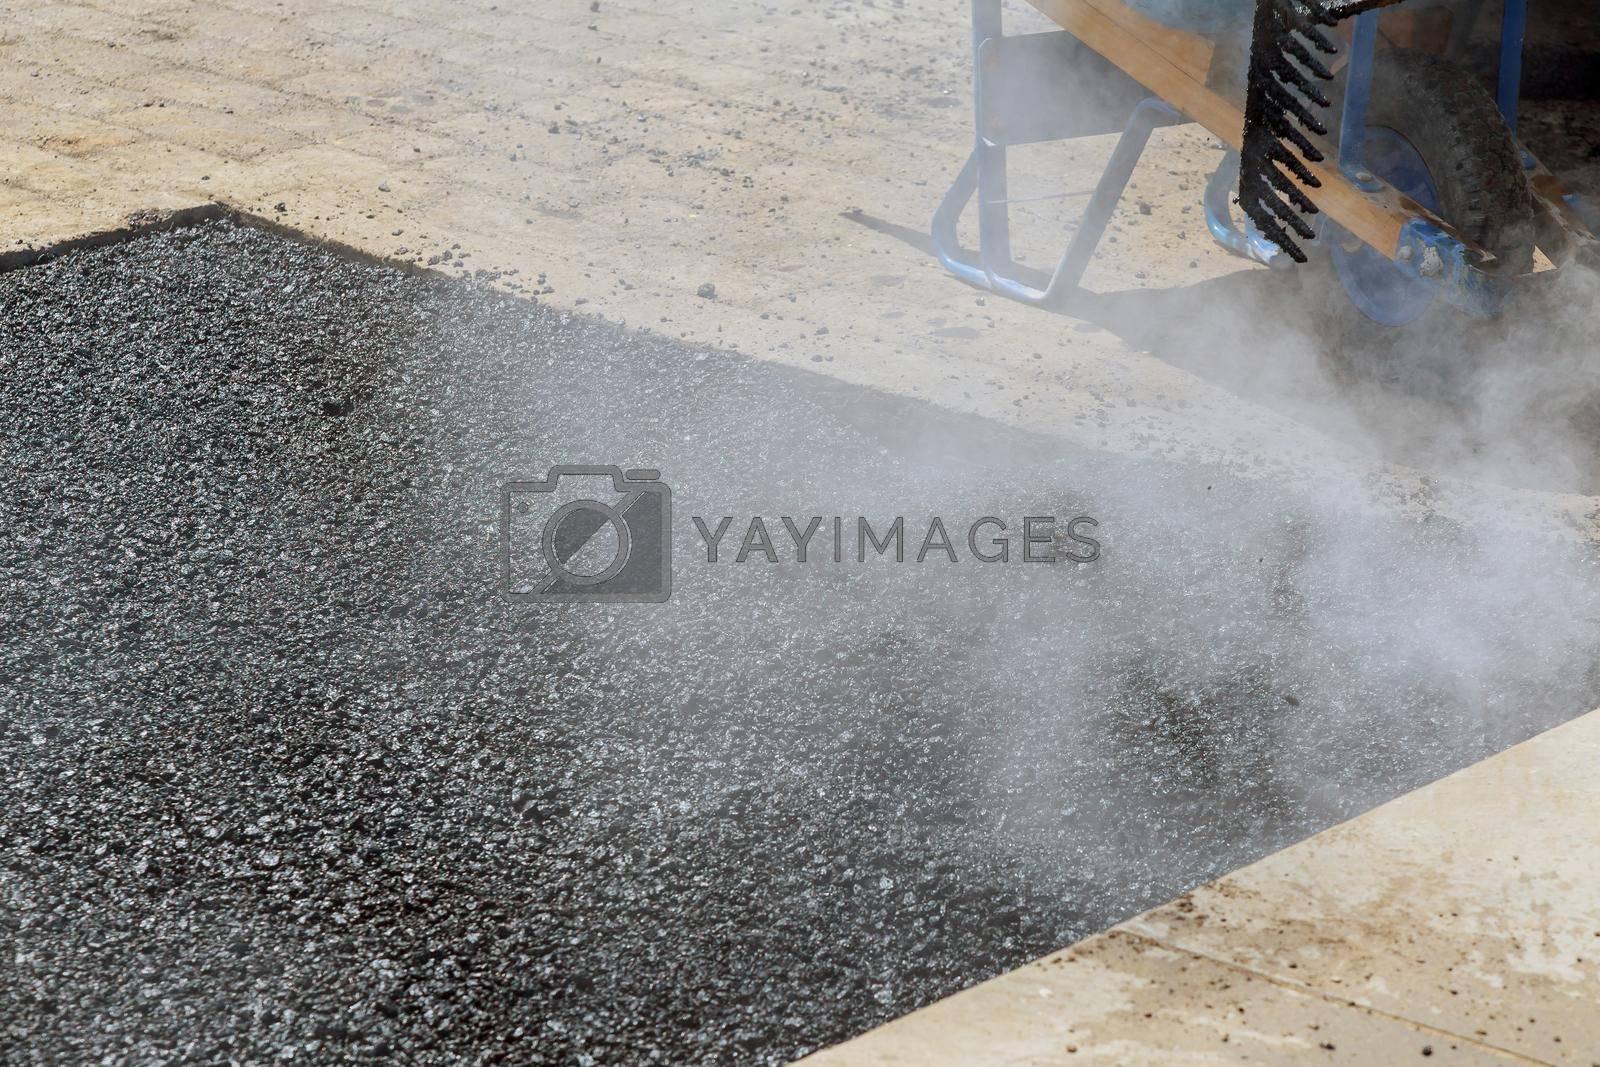 While laying asphalt new road surface road worker repair asphalt covering